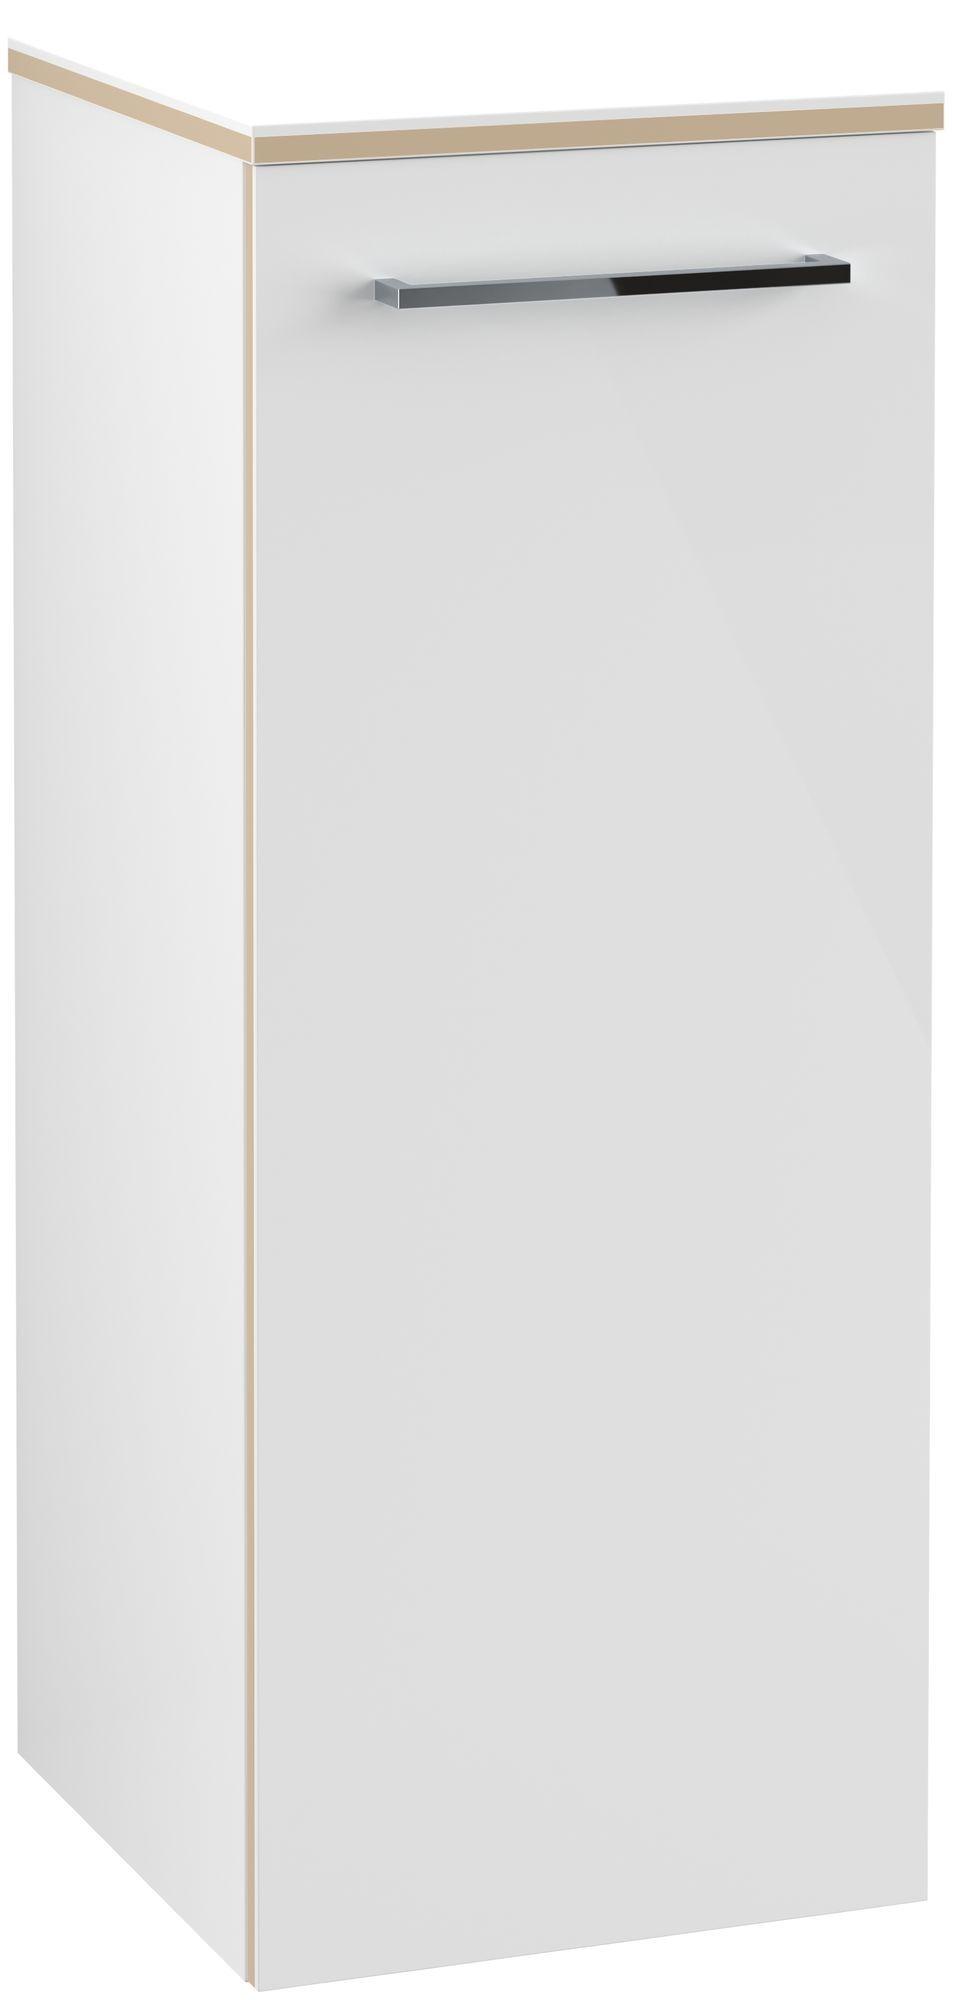 Villeroy & Boch Avento Seitenschrank Türanschlag rechts B:35 x H:89,2 x T:37 cm crystal white A89501B4